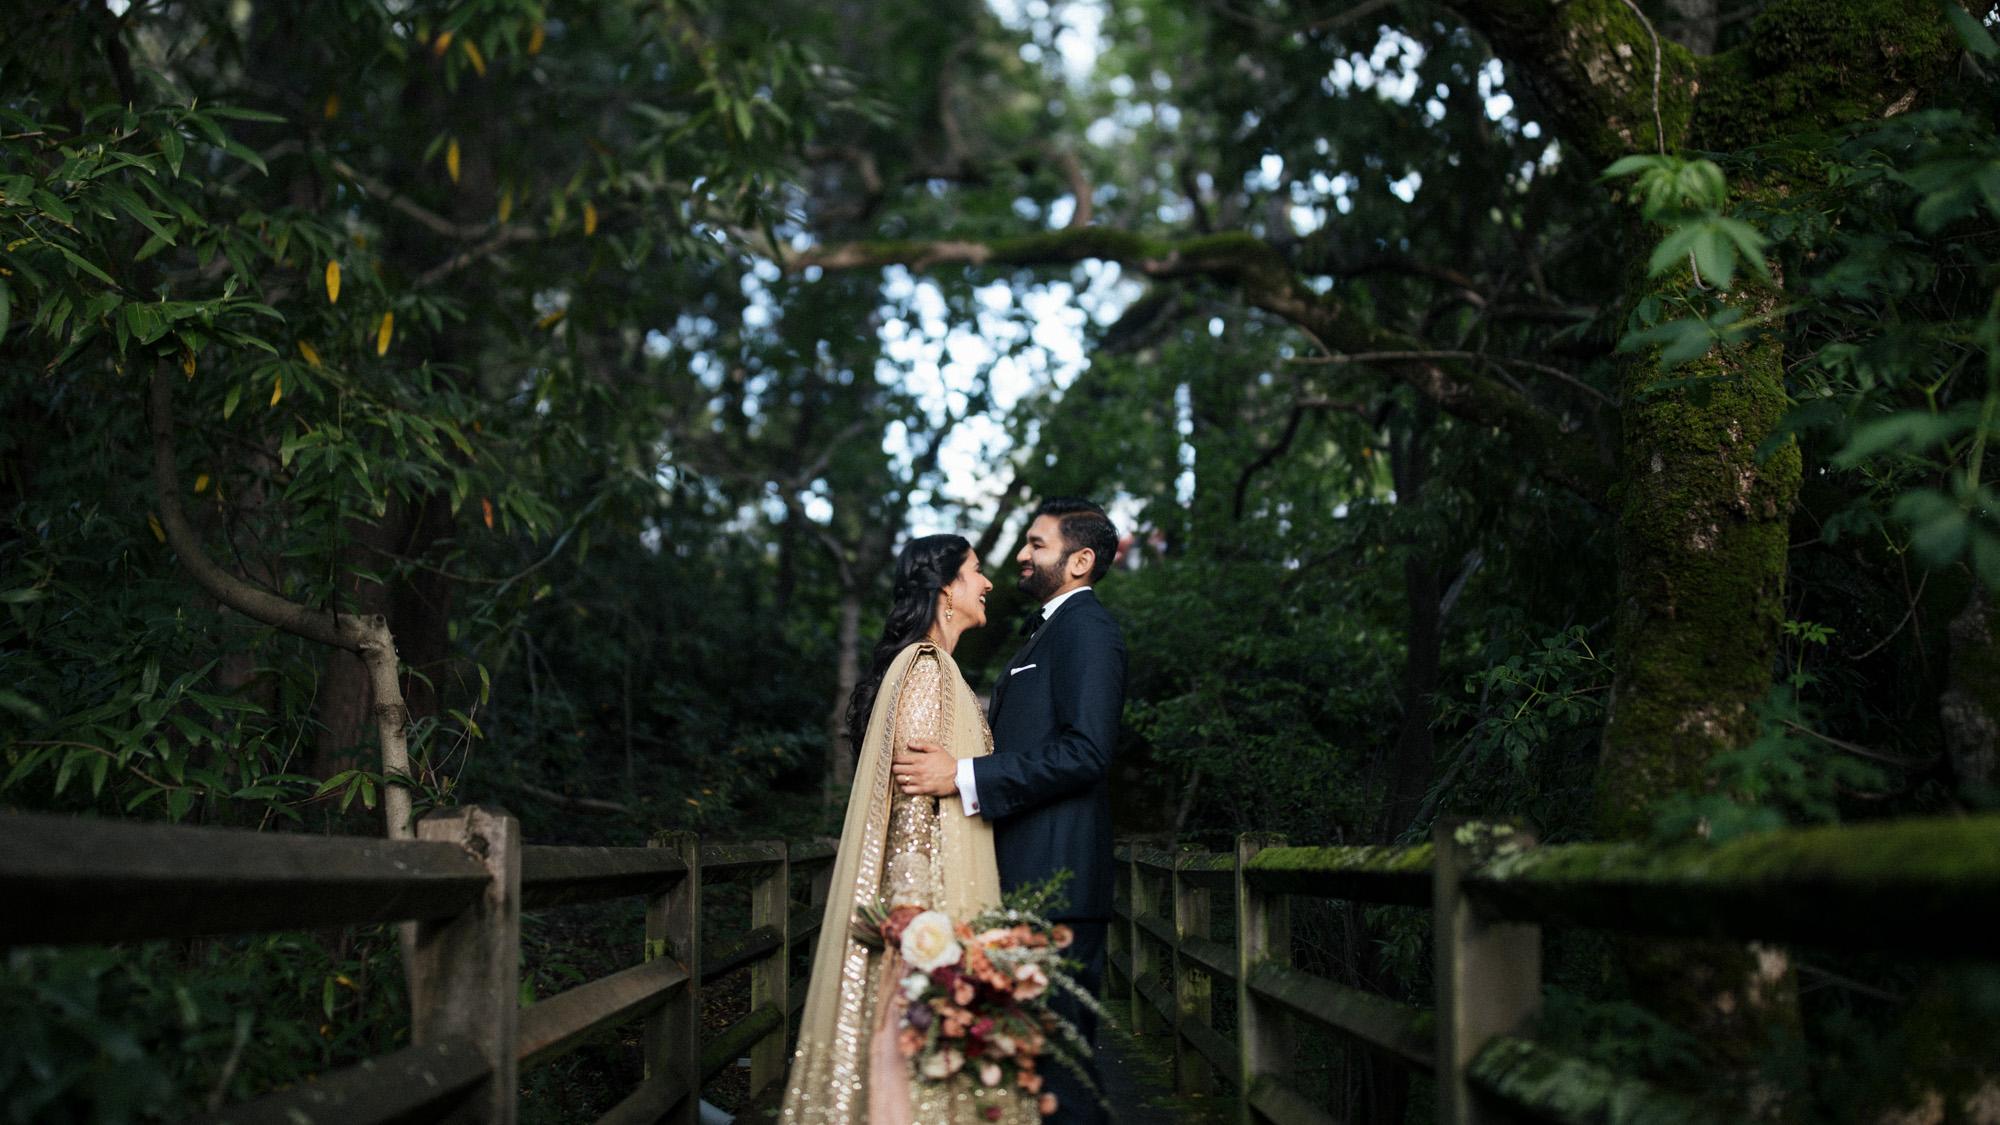 anu_maneesh_alec_vanderboom_Indian_wedding_photography-0142.jpg